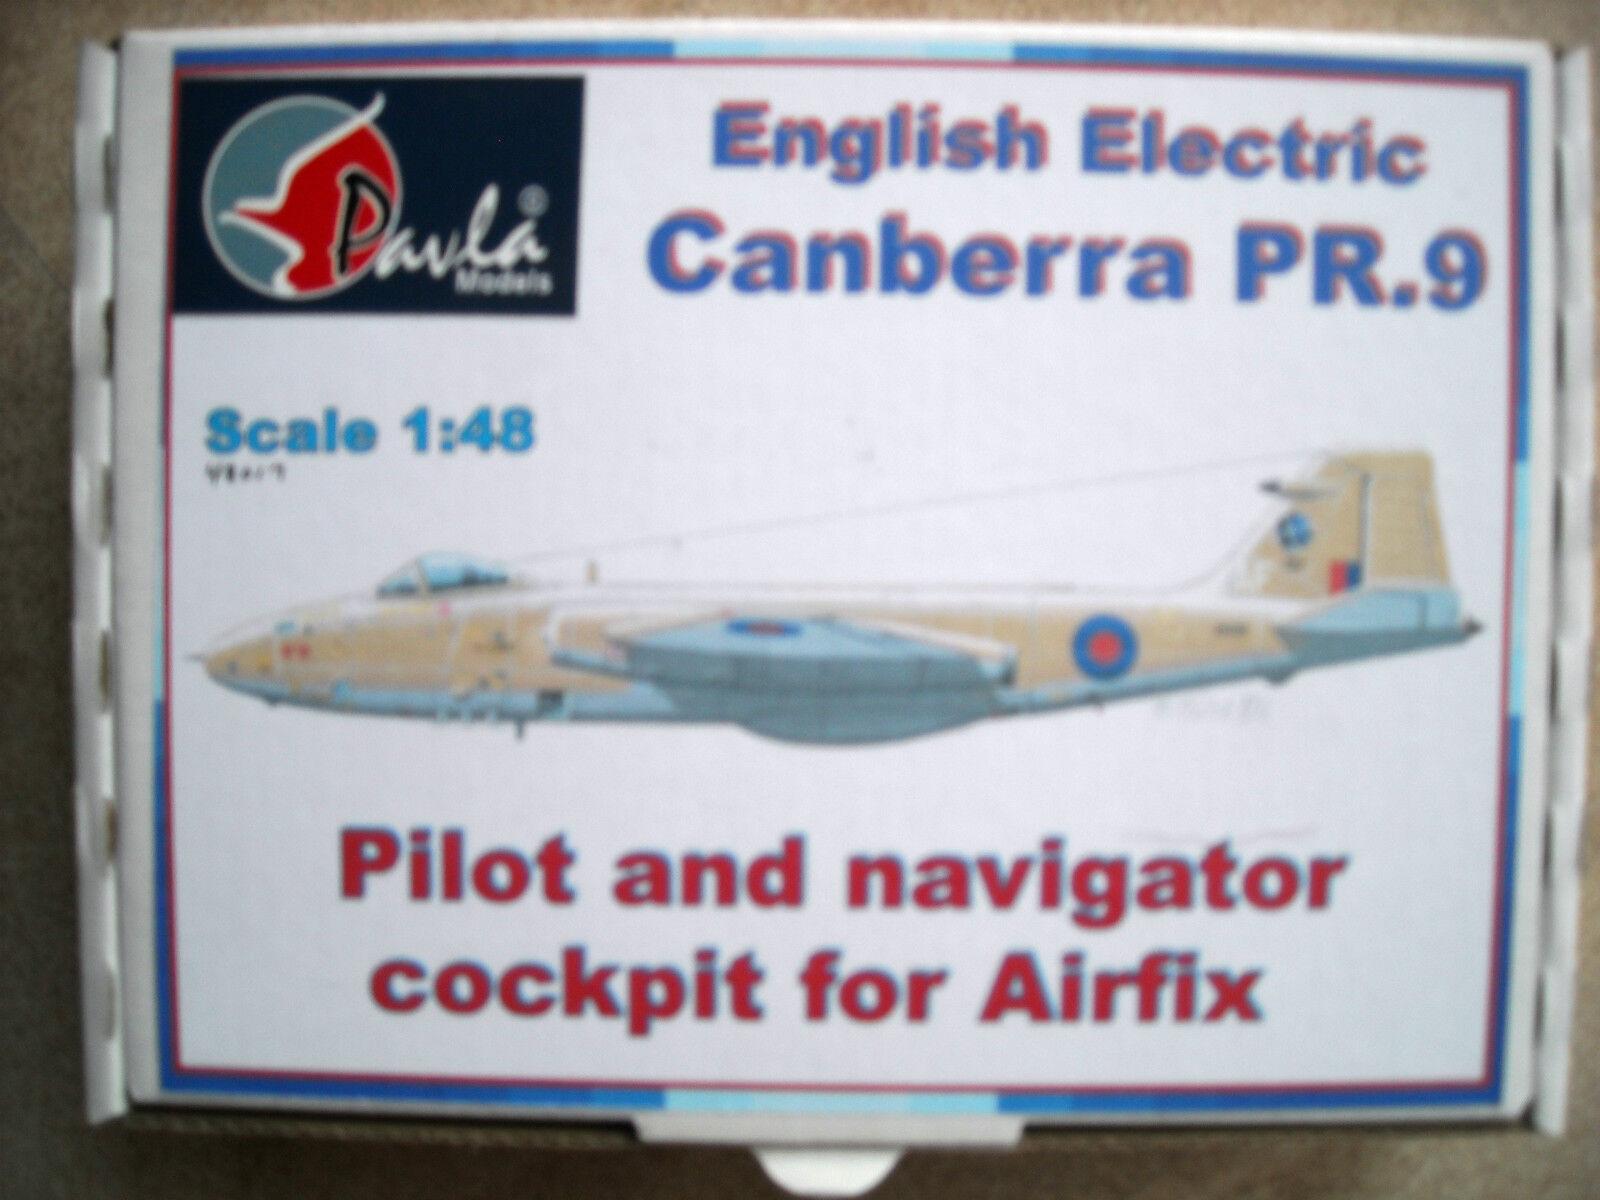 Pavla 1 48  48017 English Electric Canberra PR9 Pilot & Navigator Cockpit Airfix